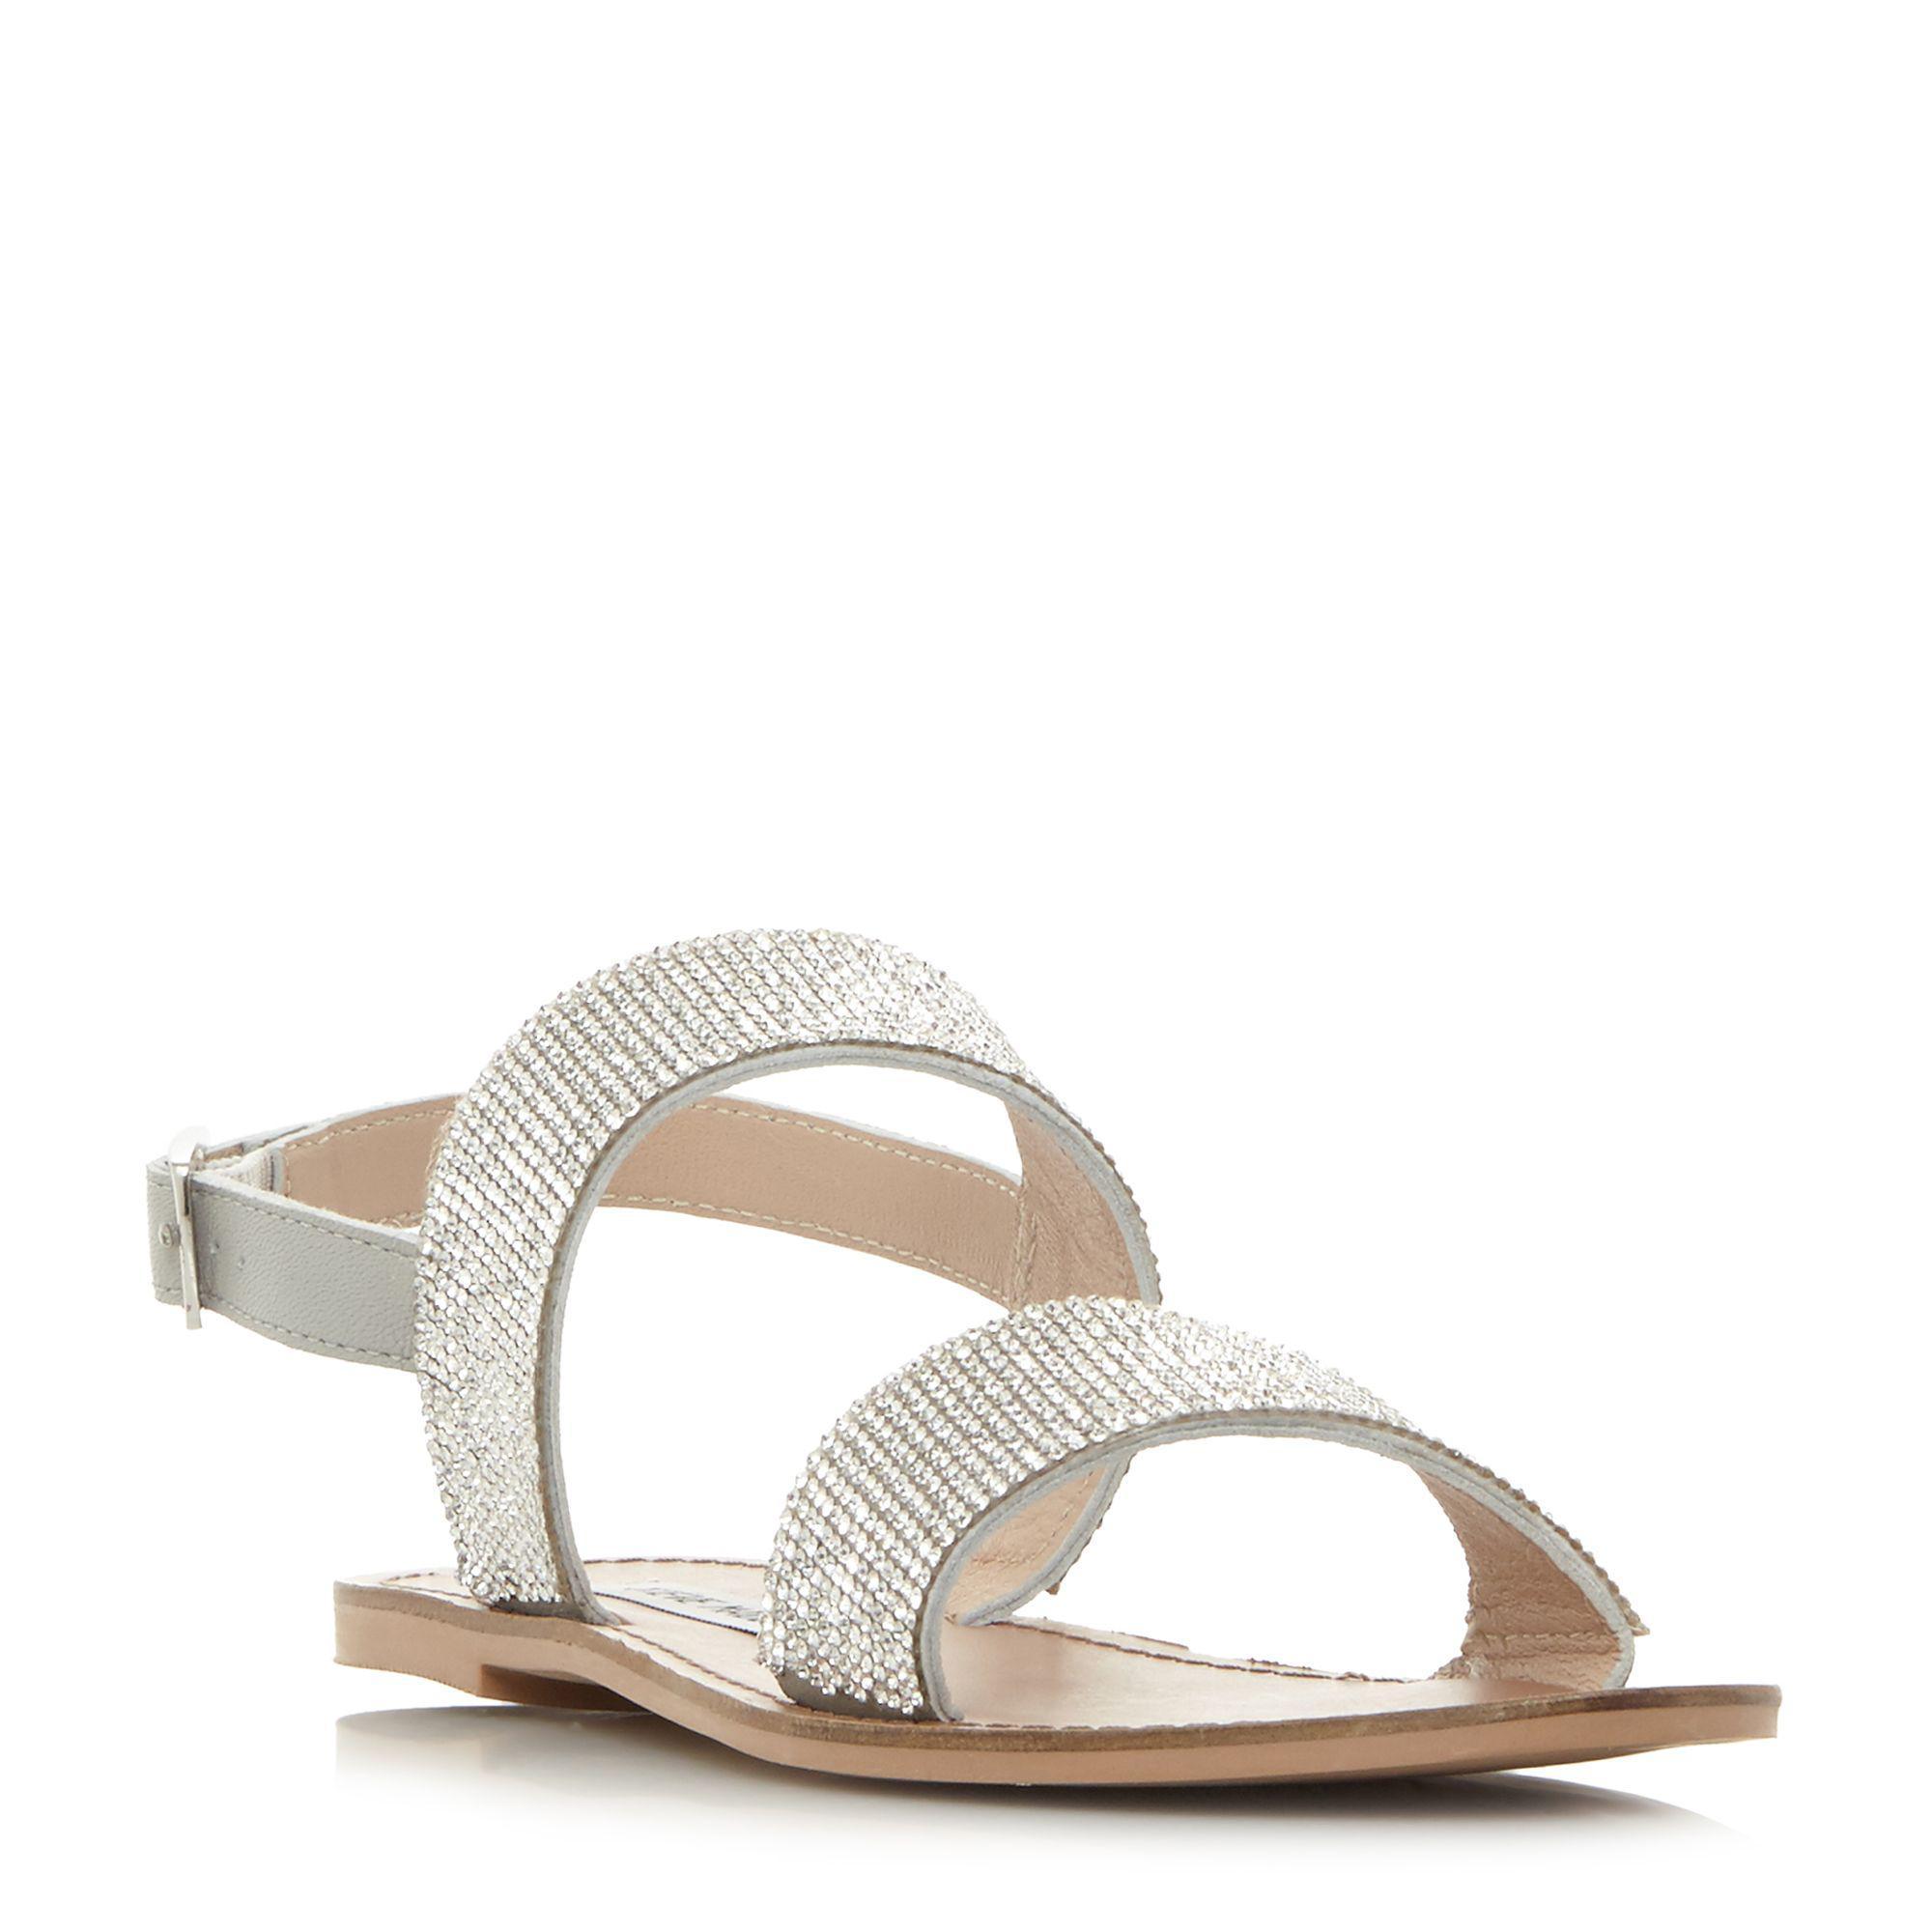 Steve Madden. Women's Metallic Alea Two Part Diamante Flat Sandals